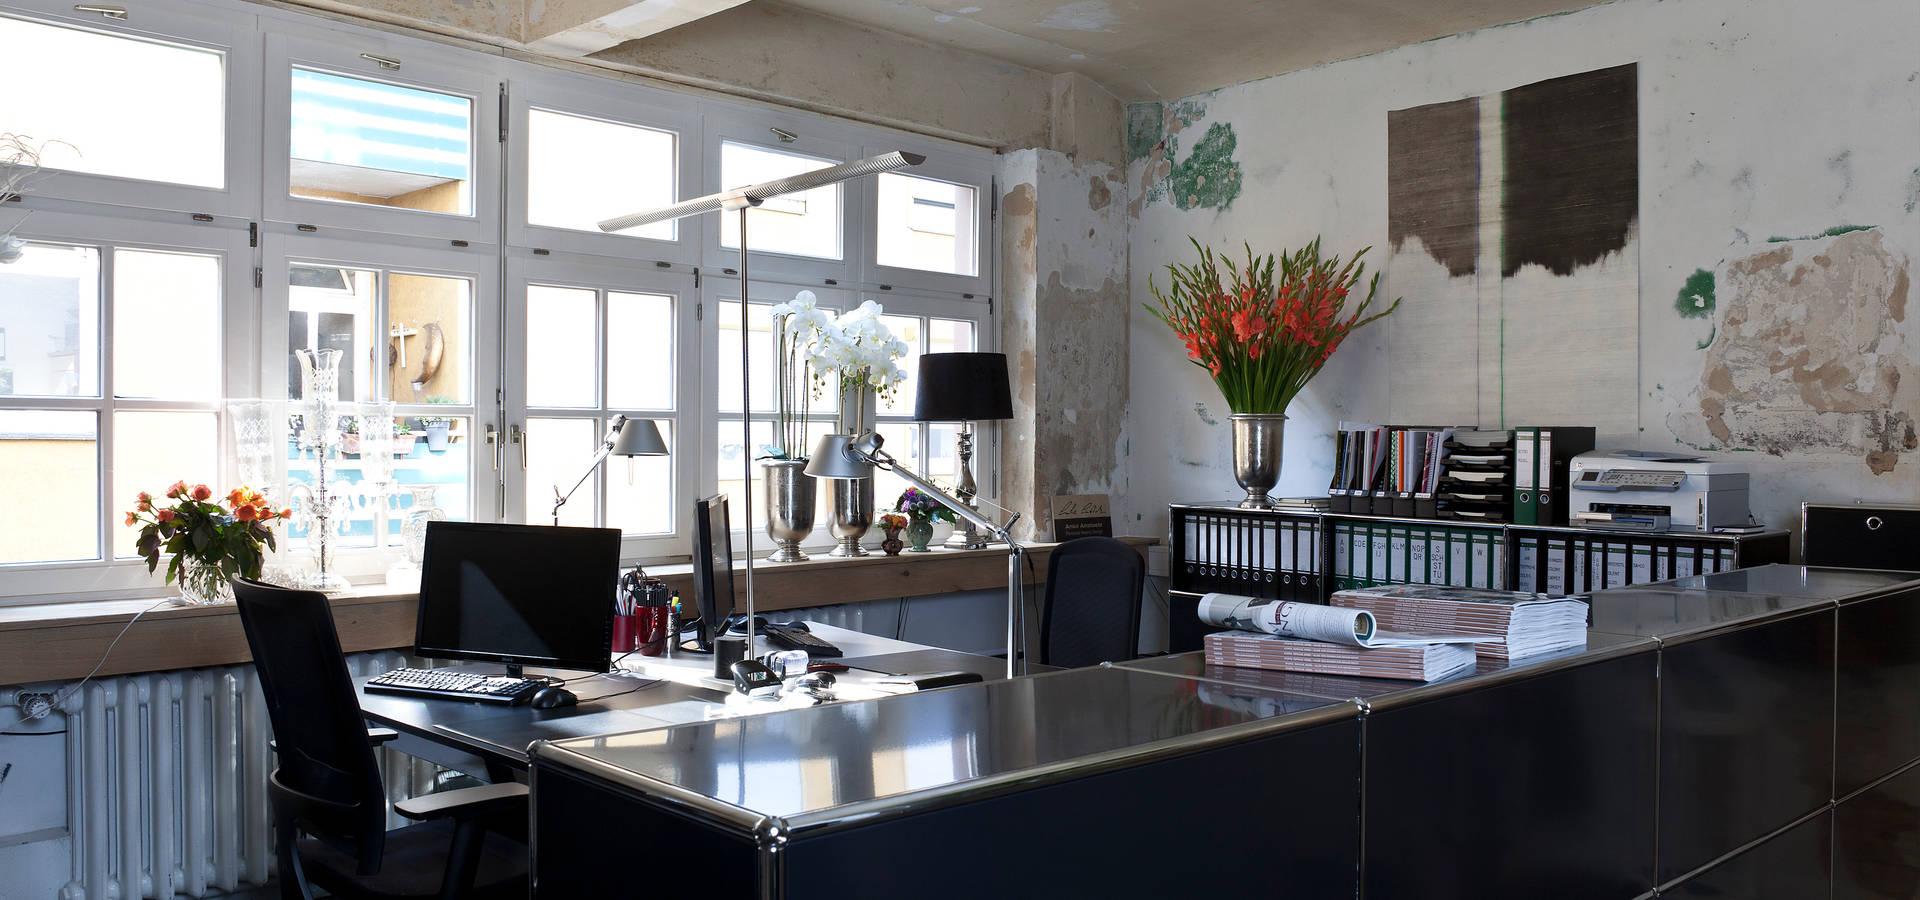 Anke Anstoetz Personal Interior Design